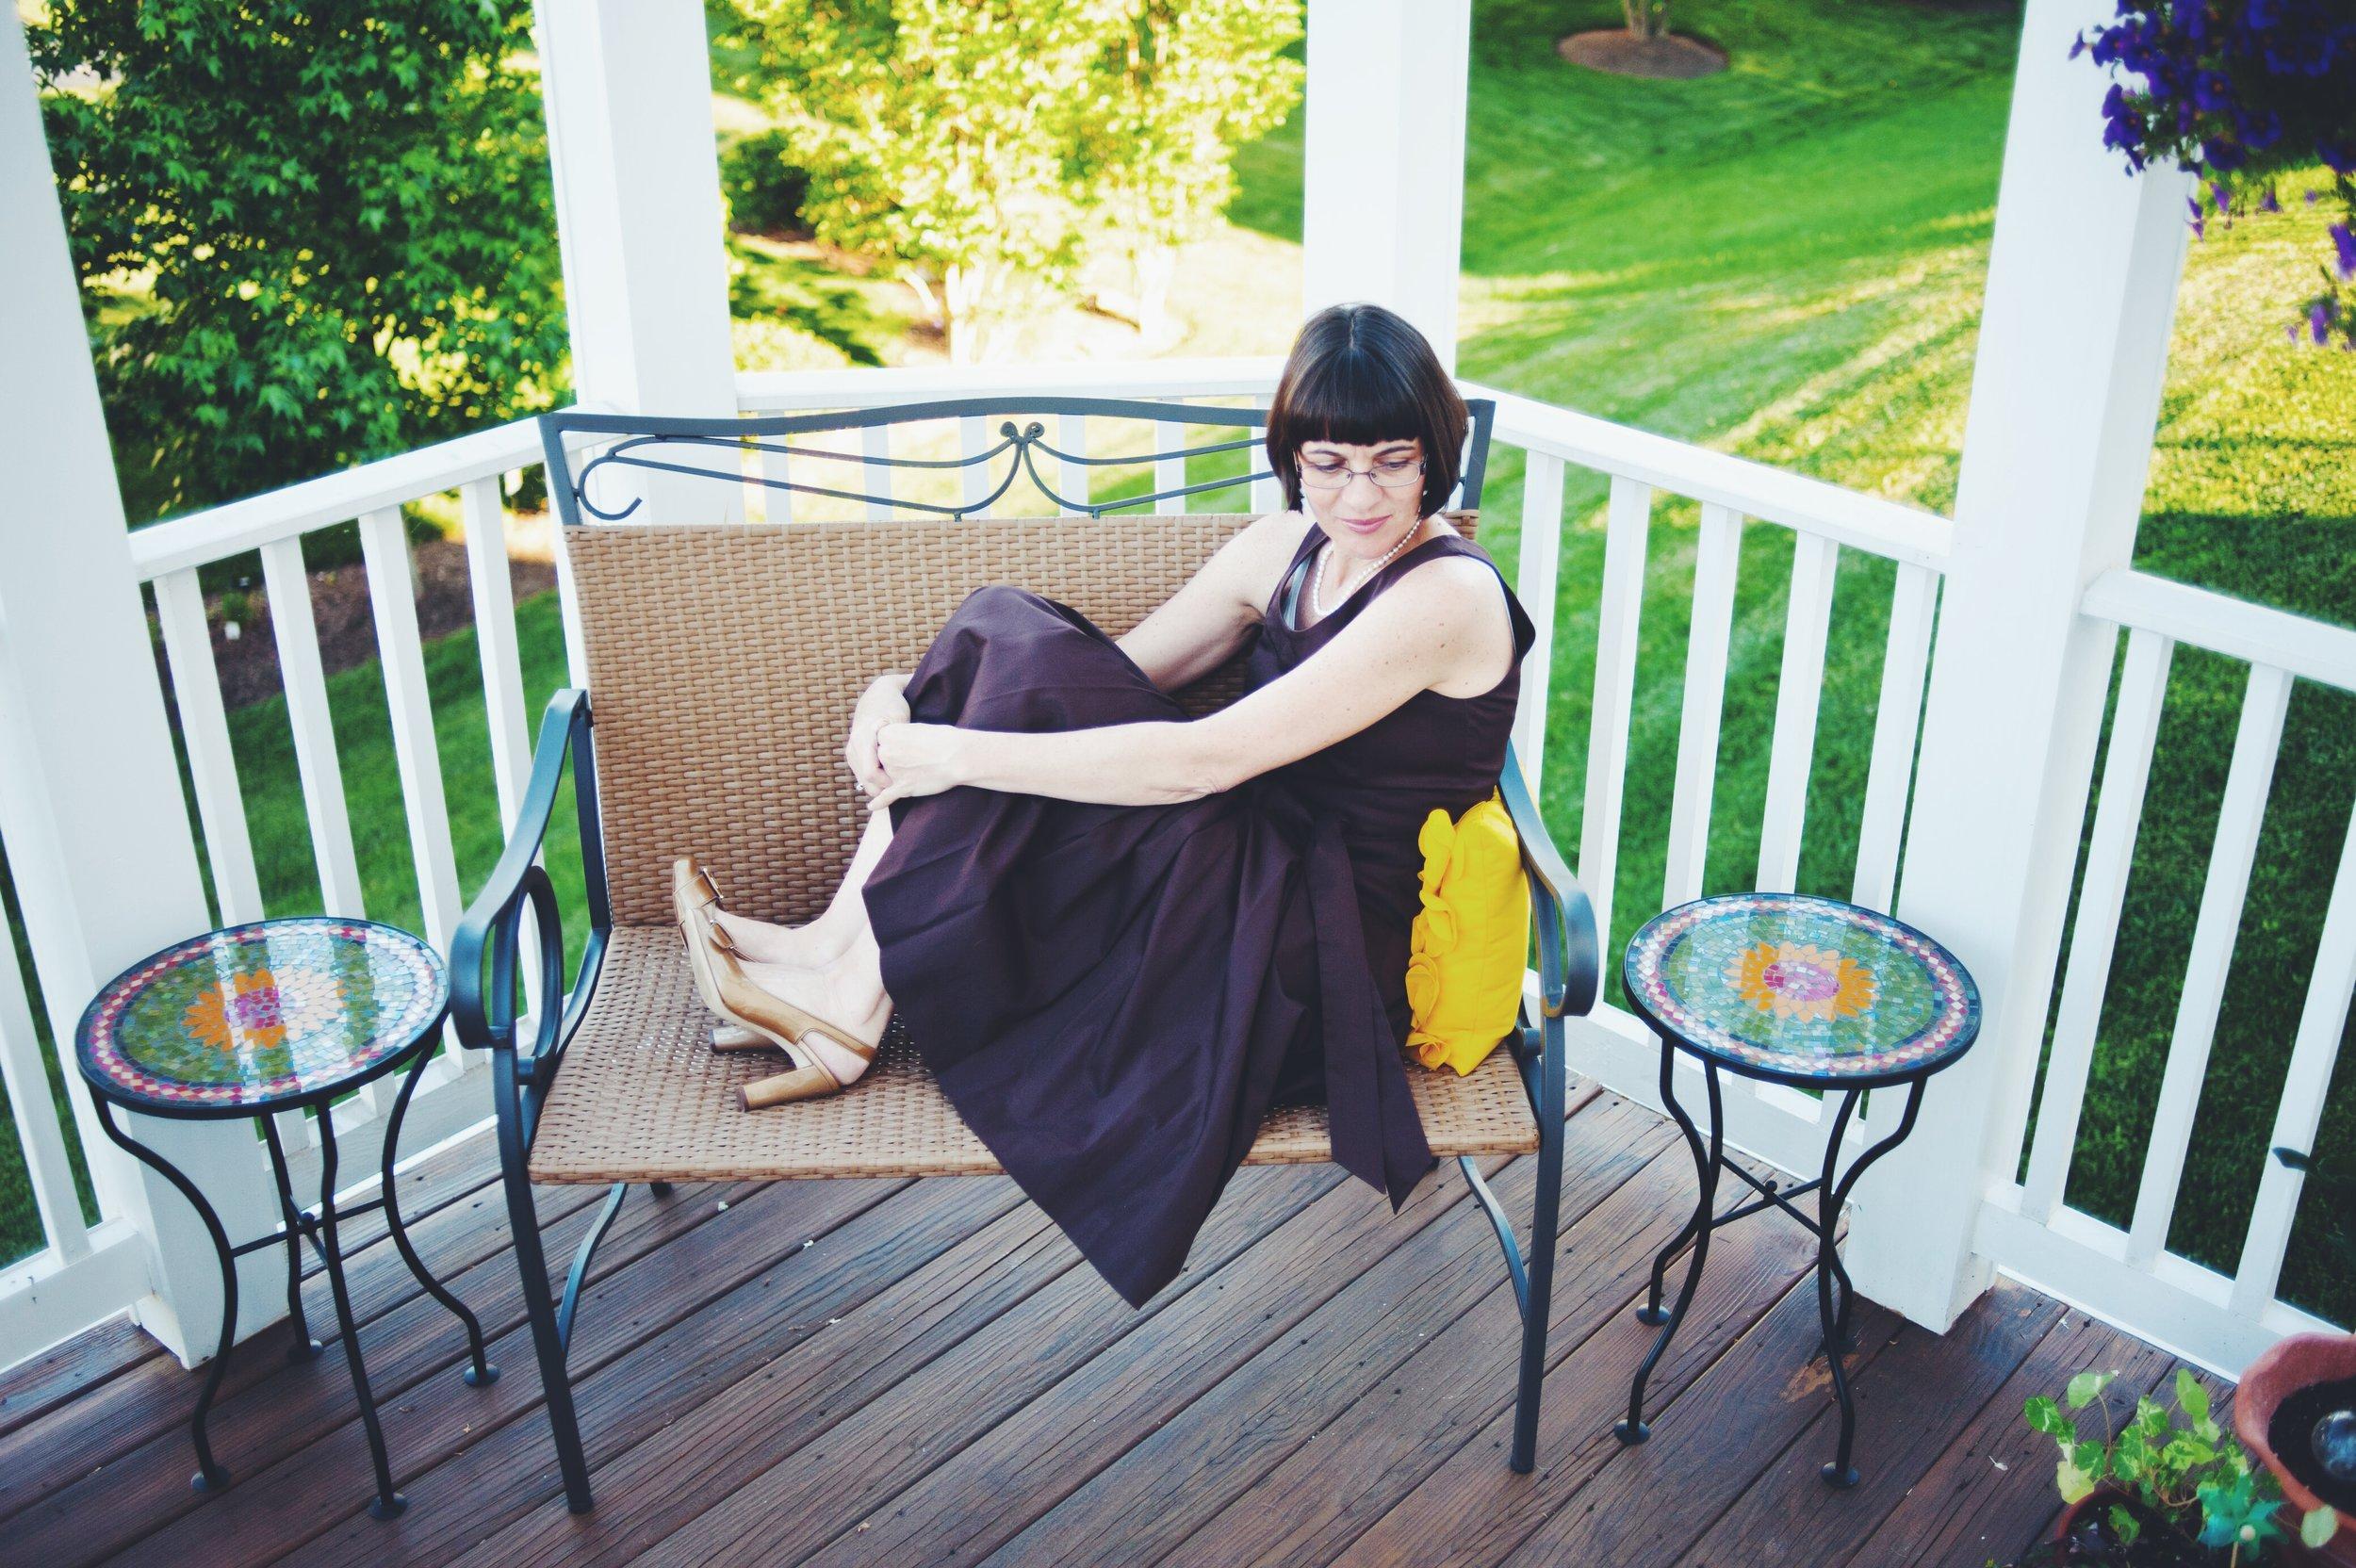 Maria-bench.jpg